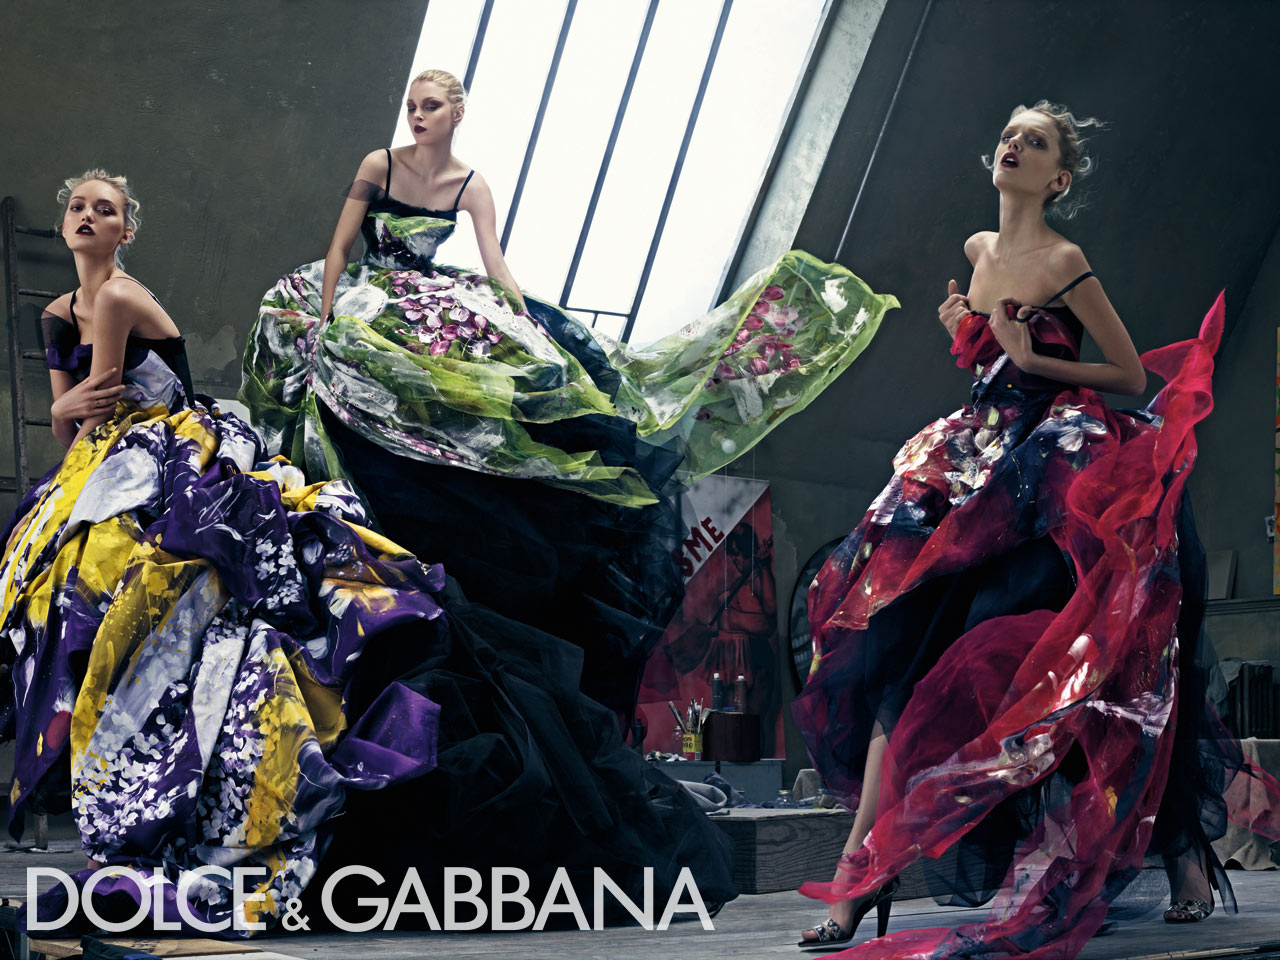 http://4.bp.blogspot.com/-qrrPLrz2IKk/TkY7V_pUZXI/AAAAAAAAABo/678I-_dTh5Y/s1600/dolce-gabbana-spring-summer-05.jpg